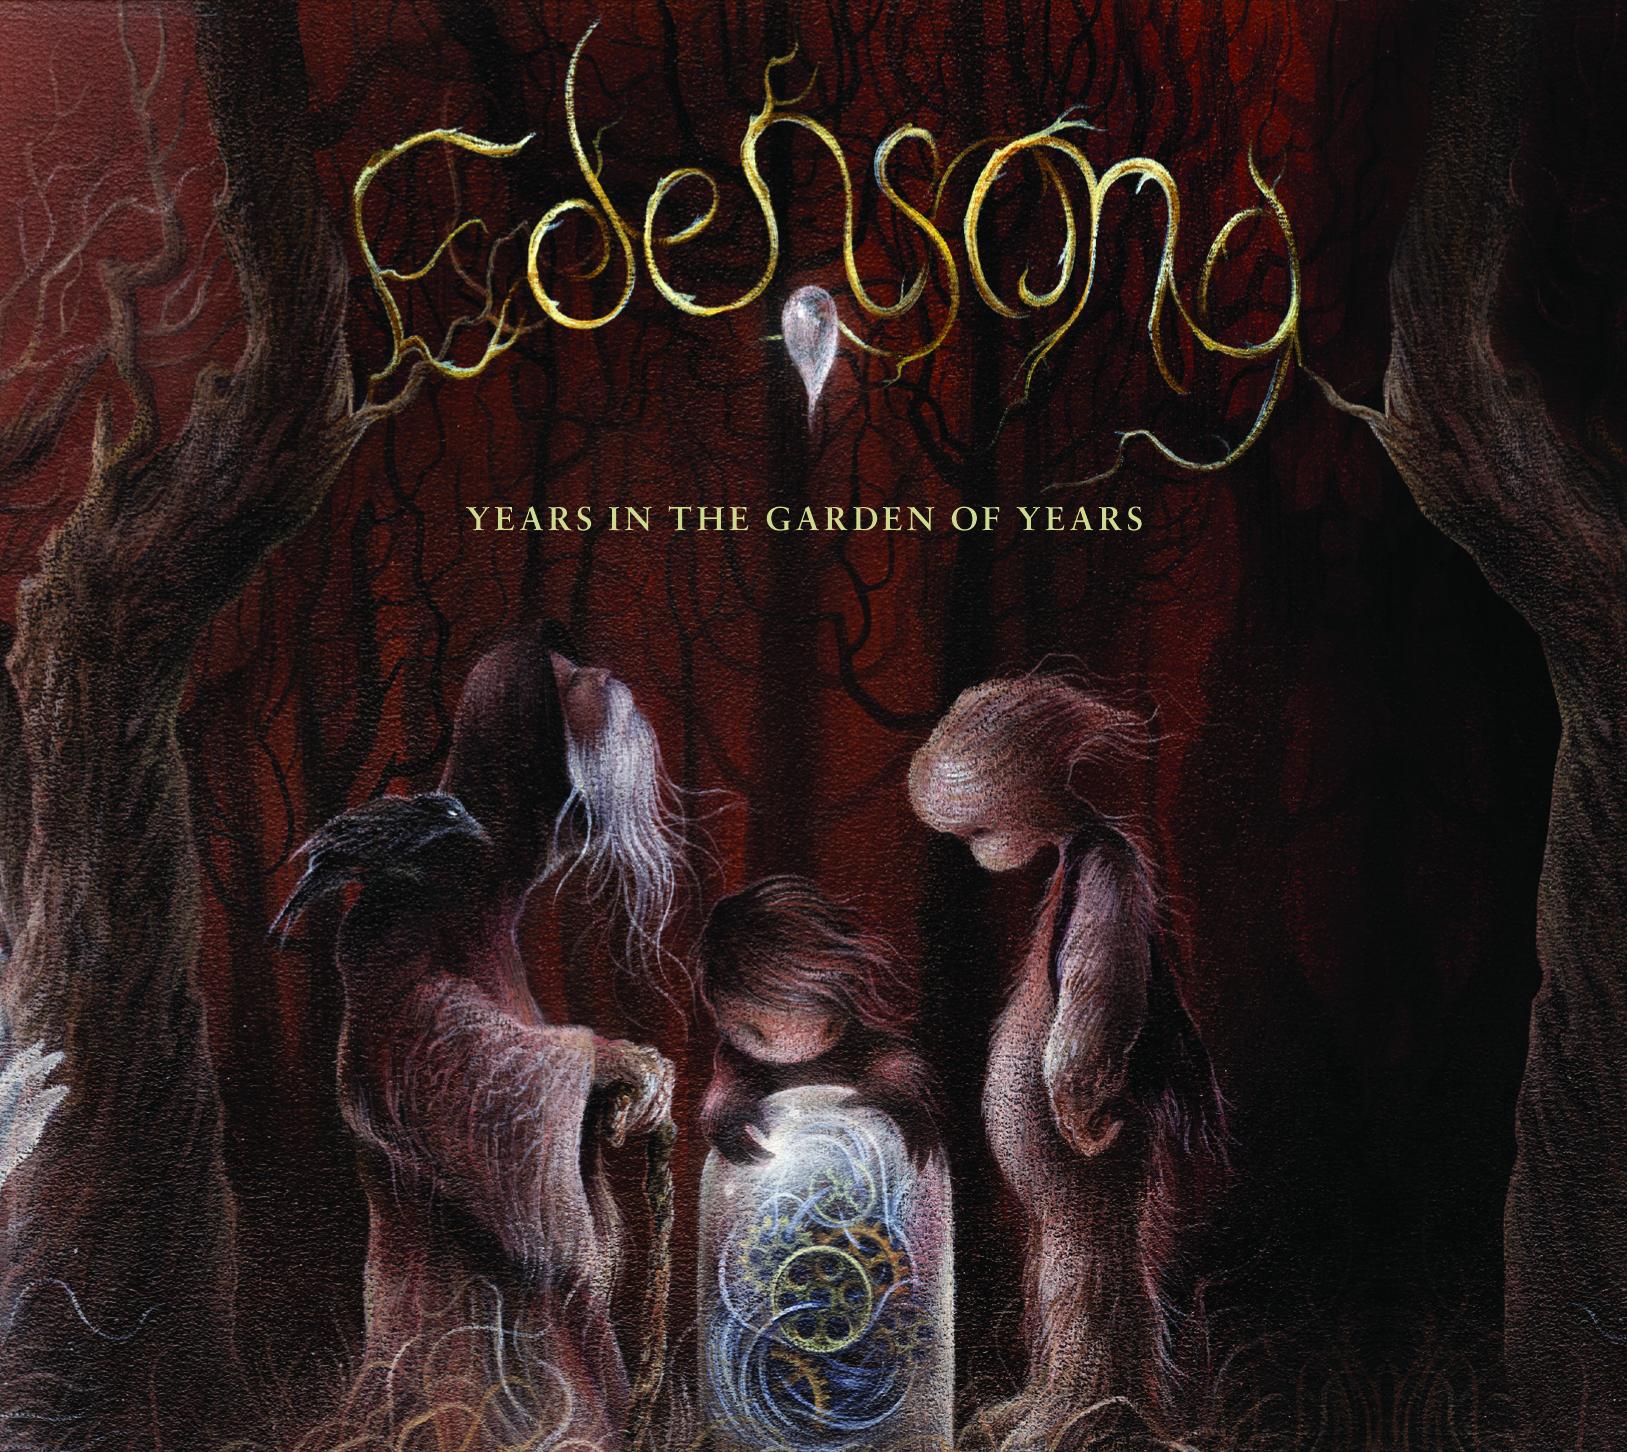 Edensong – Years In The Garden Of Years